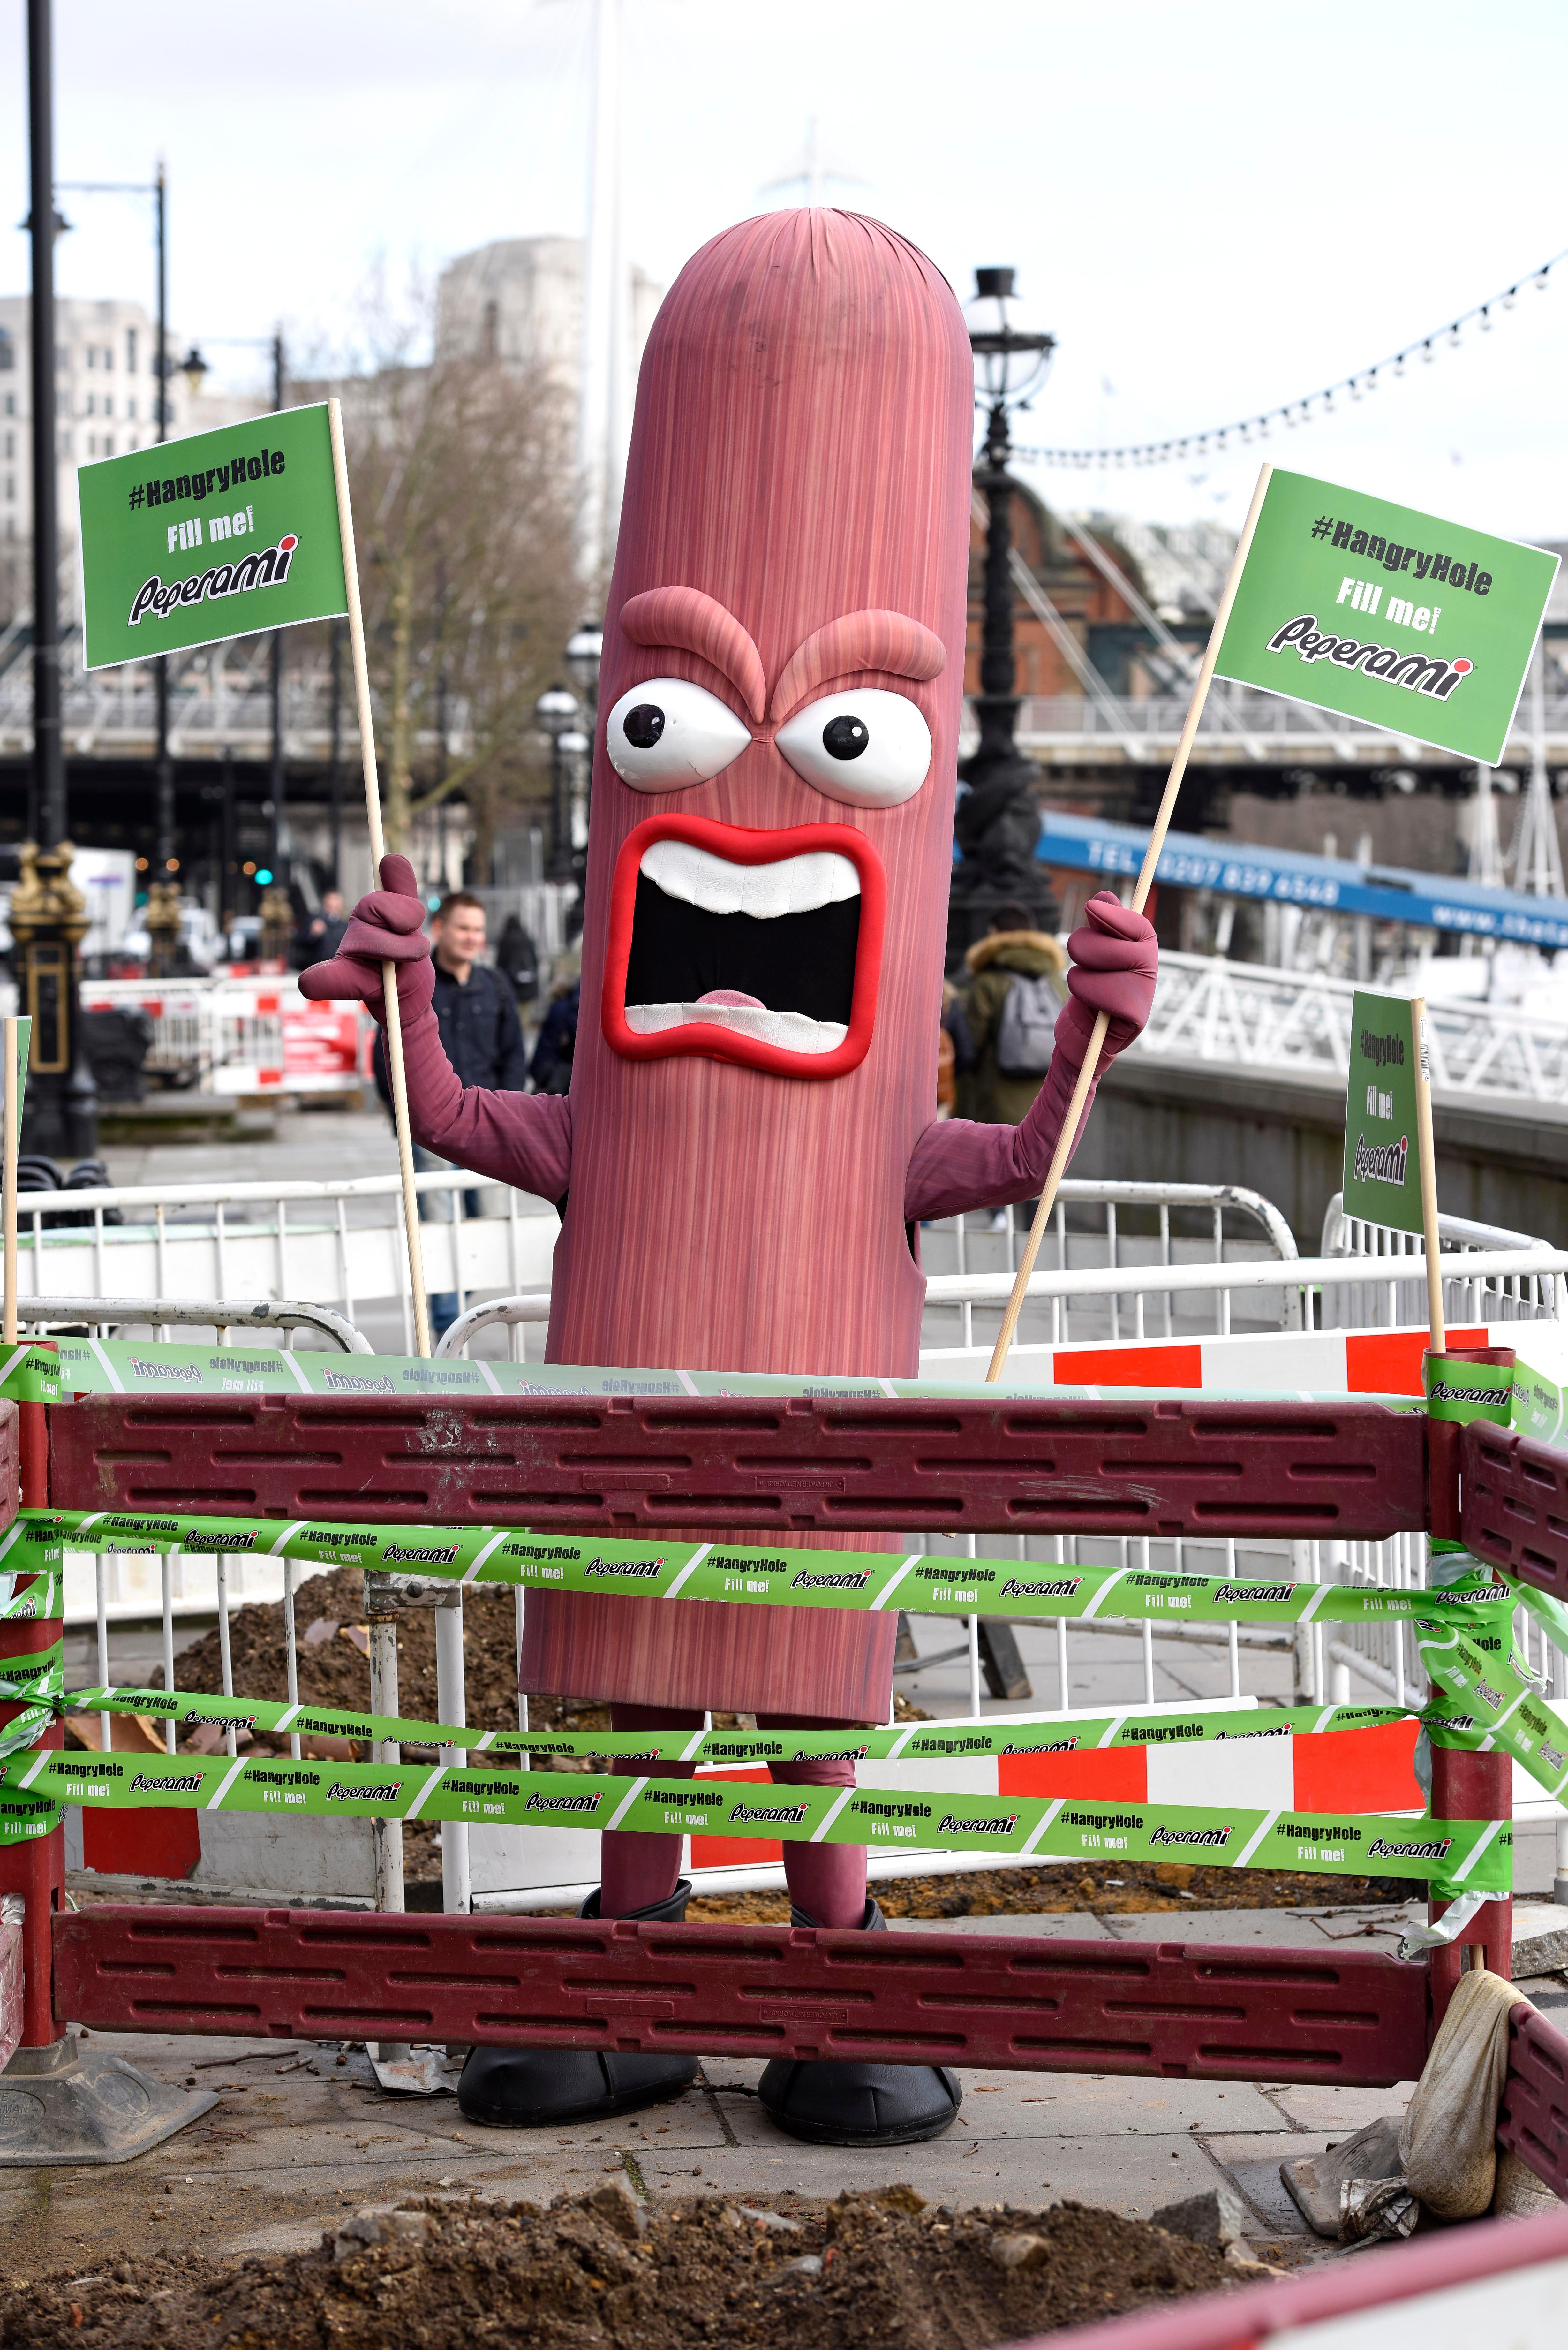 Peperami London porking #hangryhole pr stunt guerrilla marketing